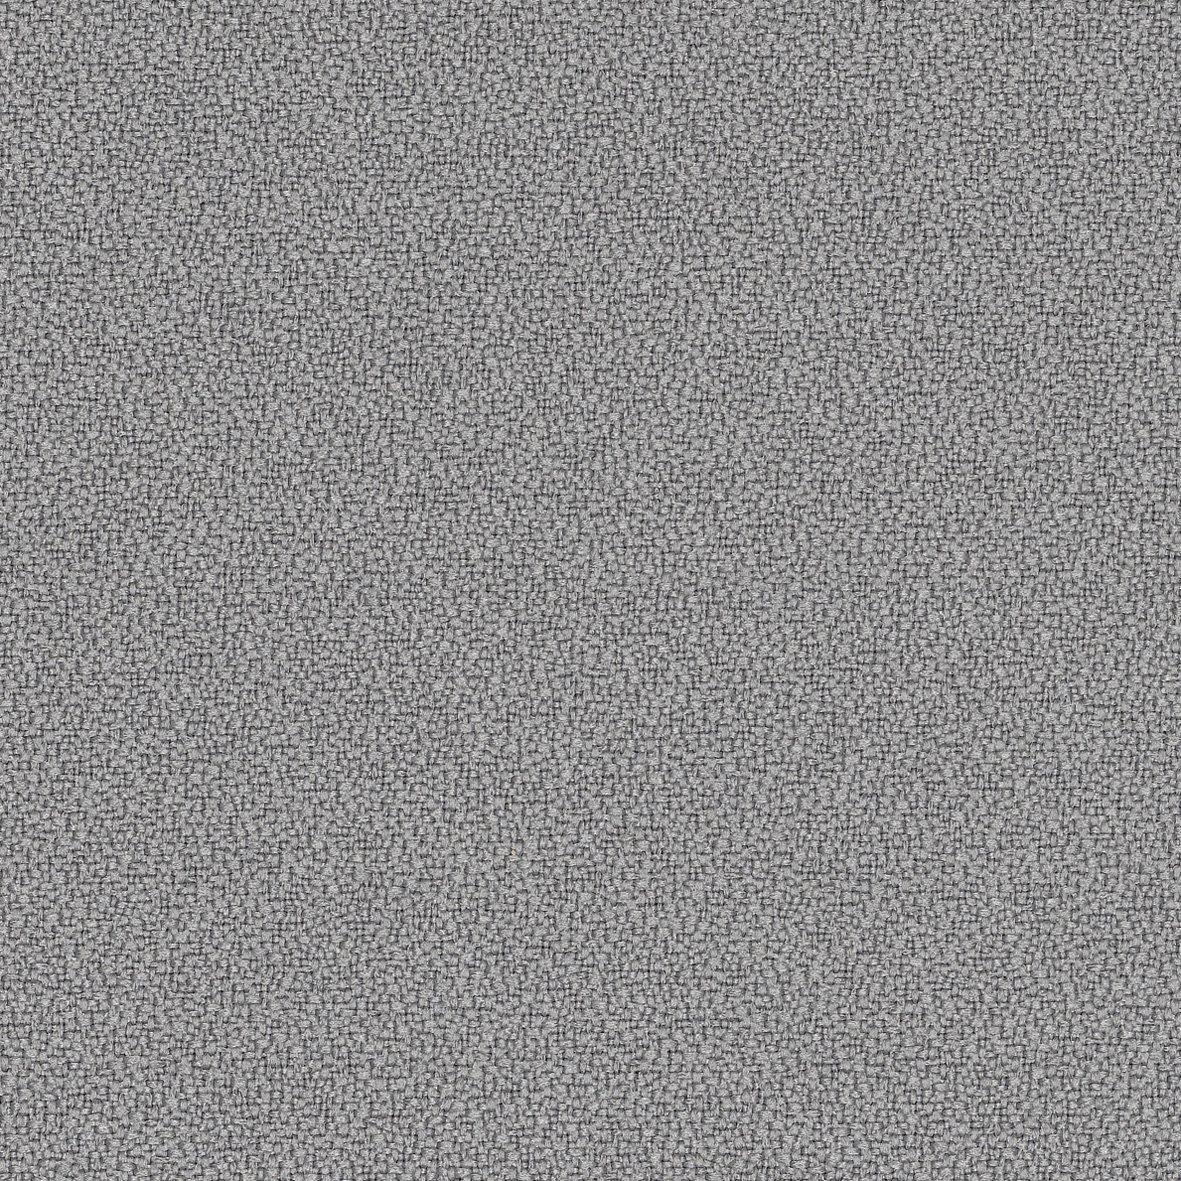 Softline bordskærmvæg grå B1000xH450 mm